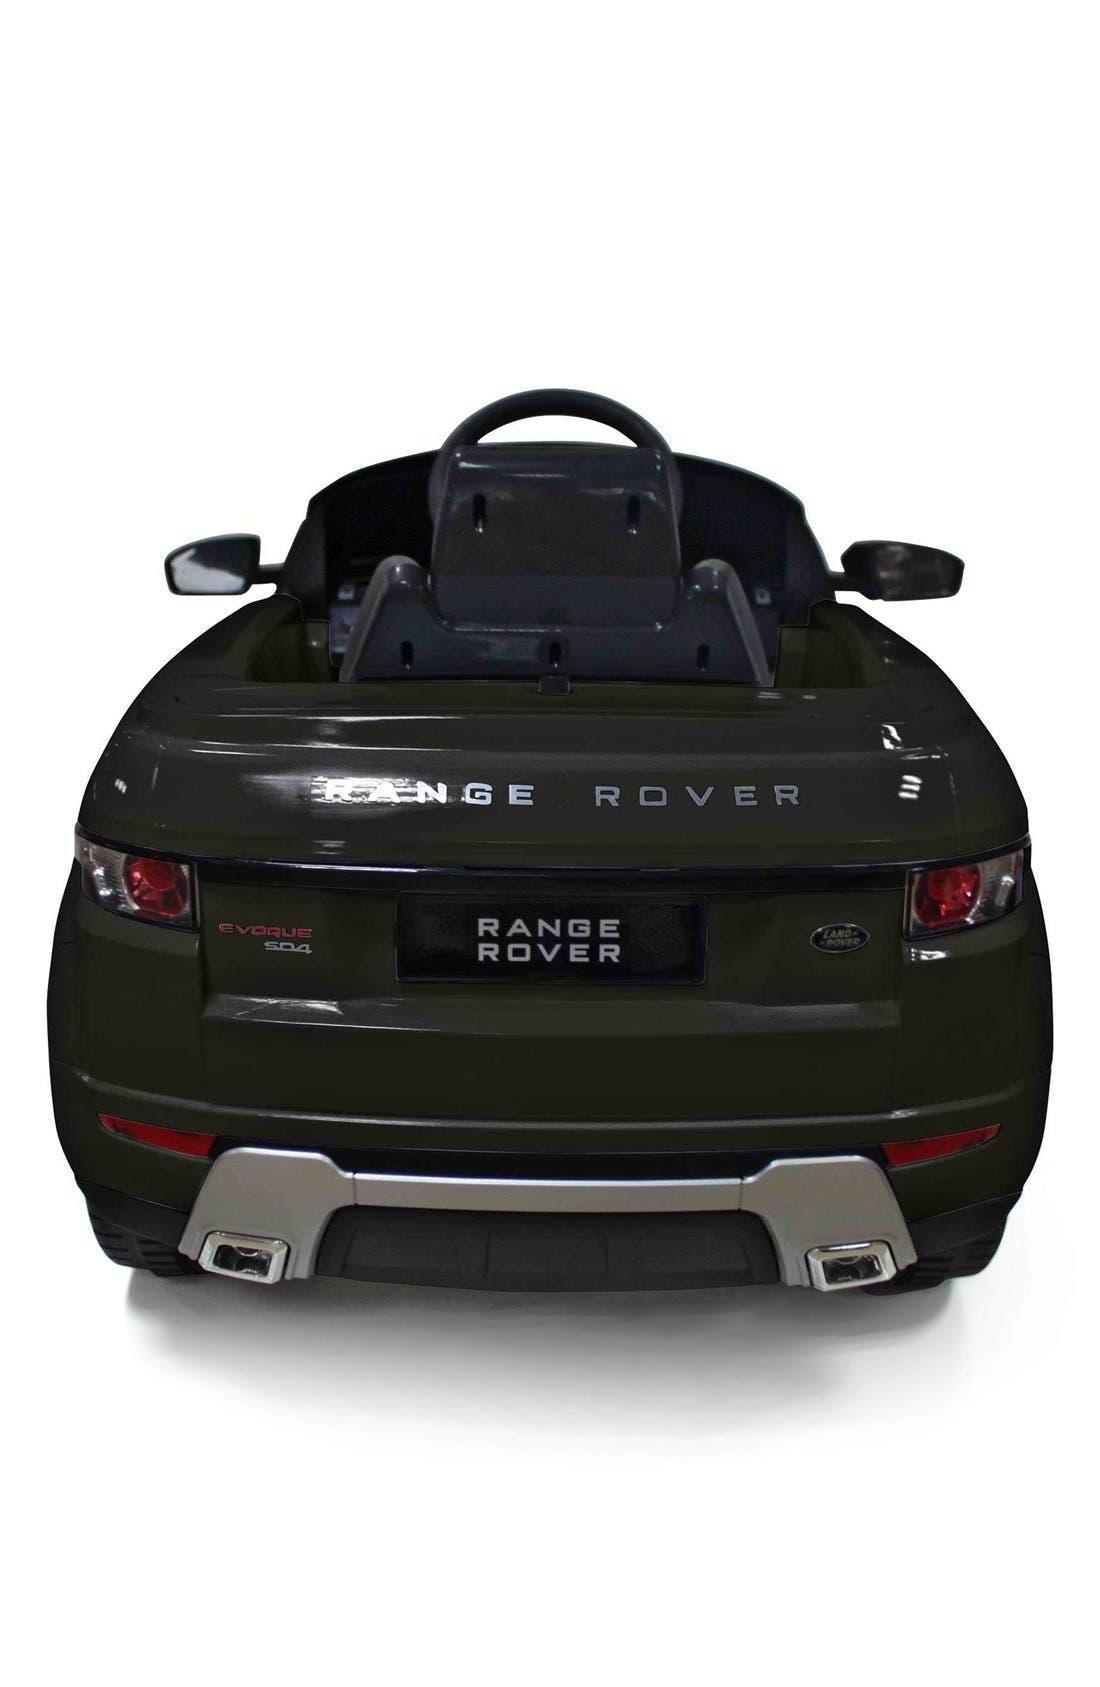 'Range Rover Evoque' 12V RC Ride-On Toy Car,                             Alternate thumbnail 2, color,                             001